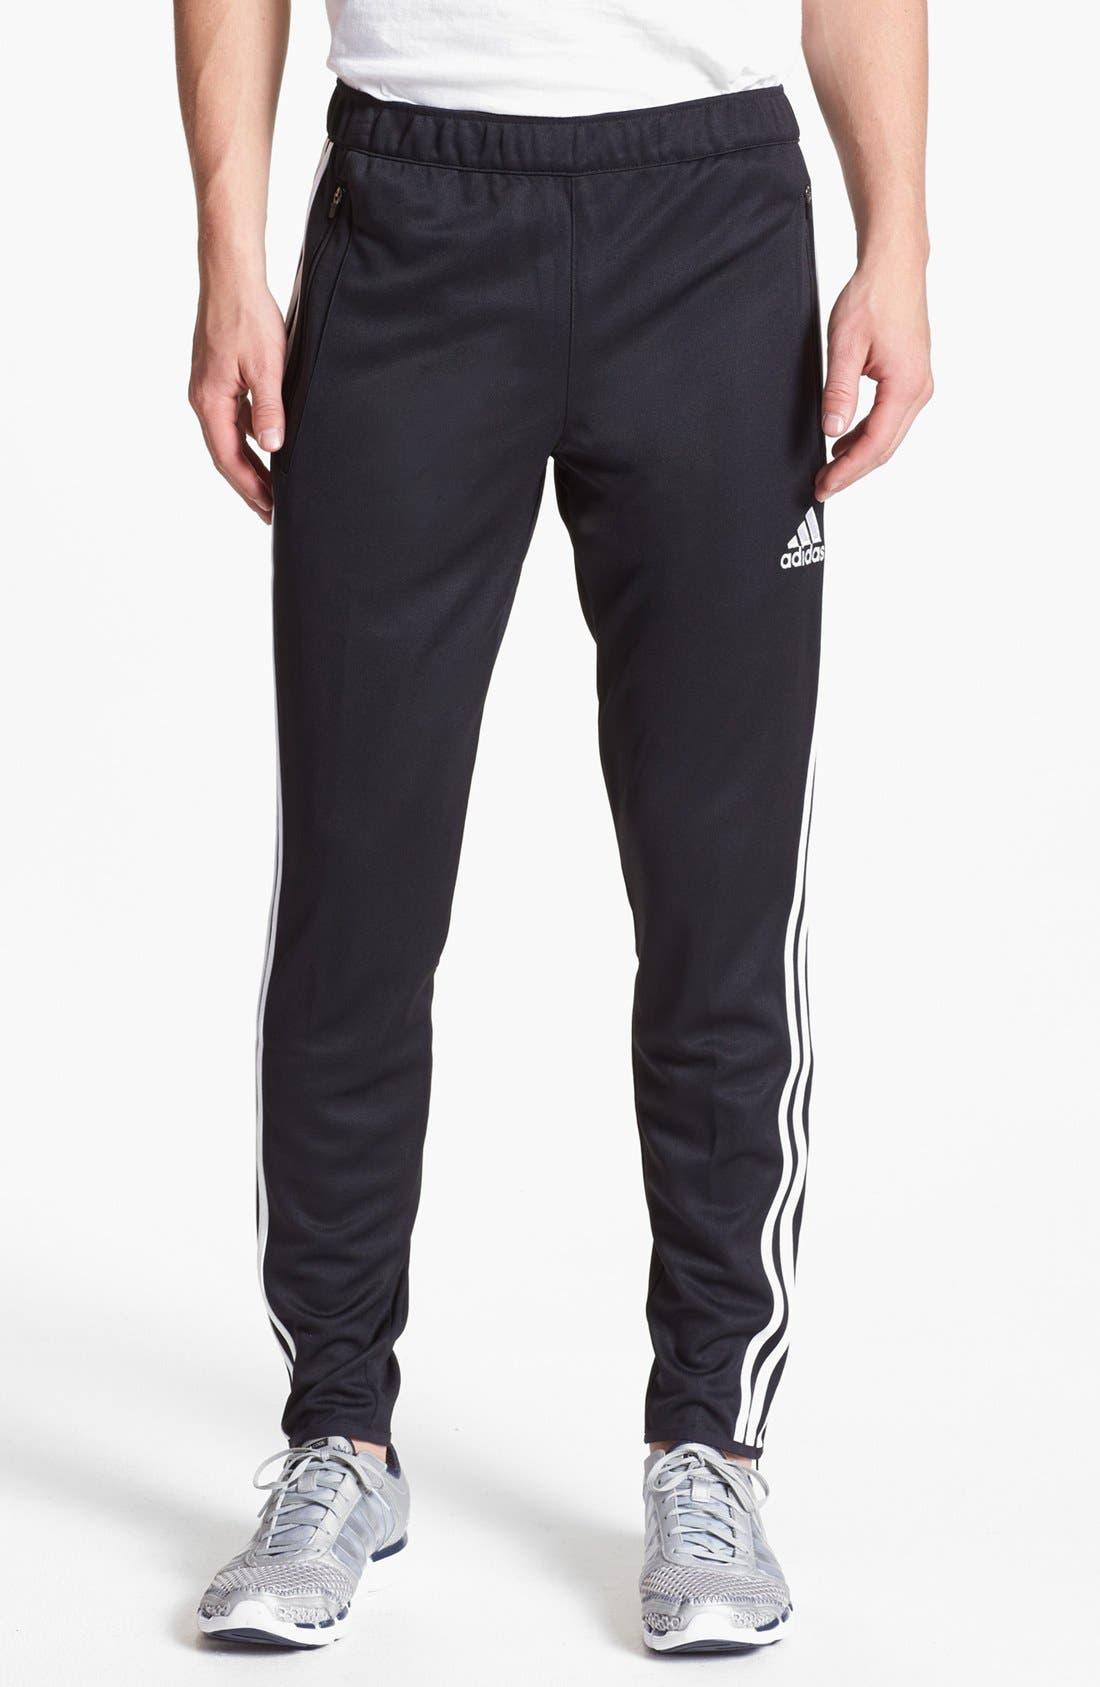 ADIDAS 'Tiro 13' Slim Fit Training Pants, Main, color, 001